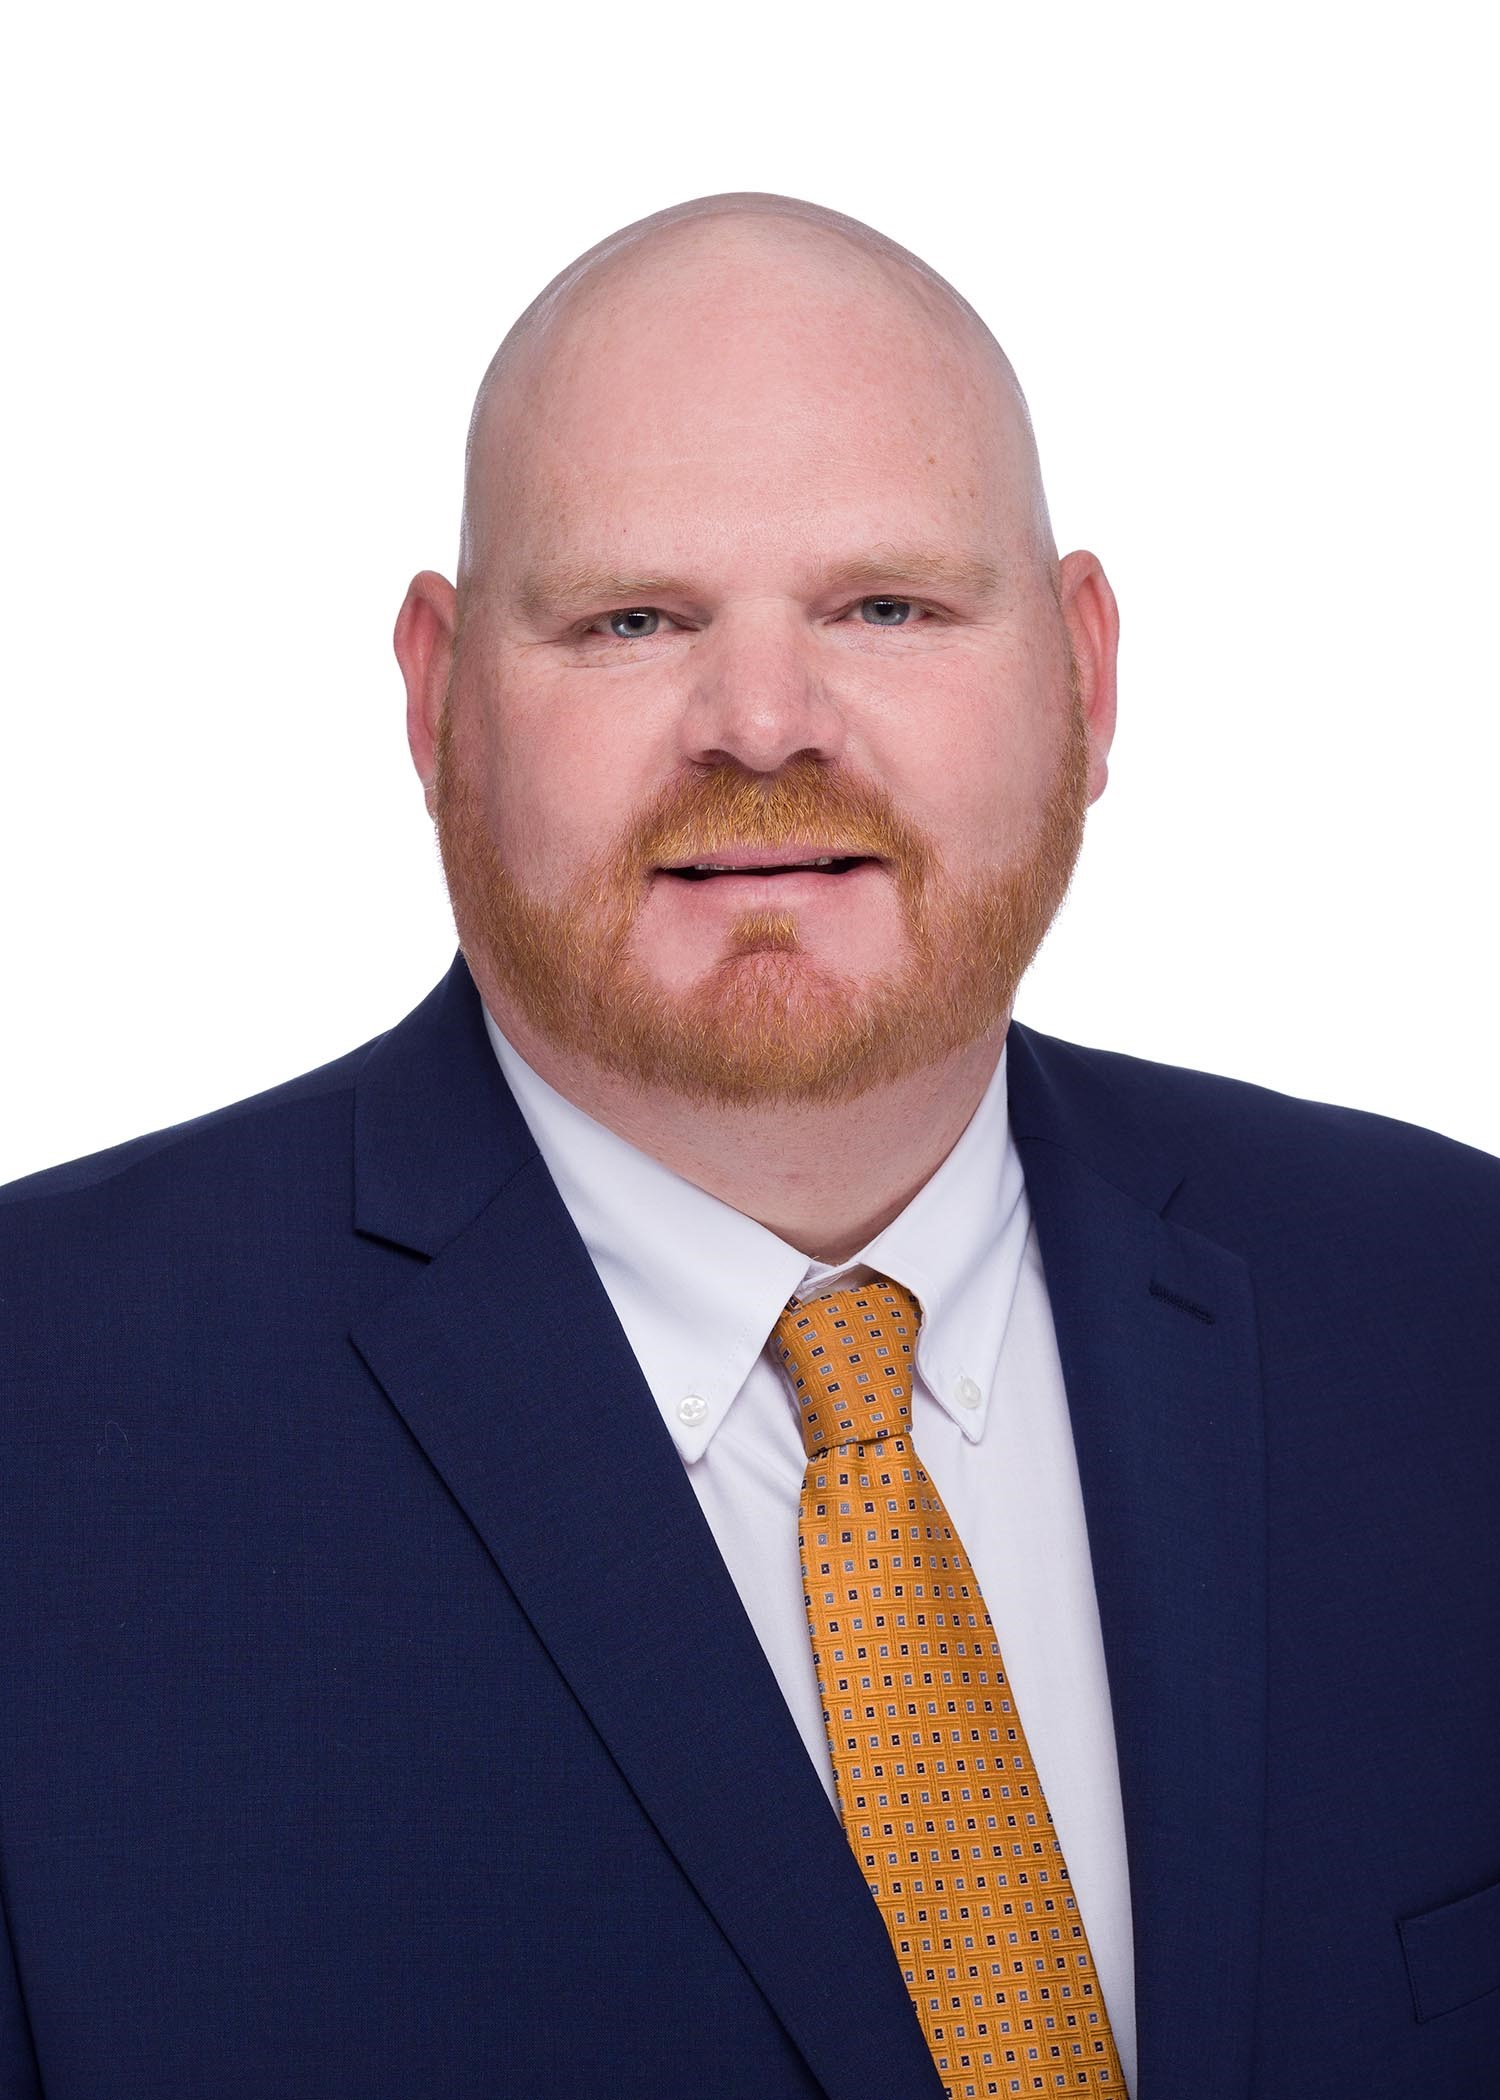 Greg Haag headshot for Compass Insurance Group